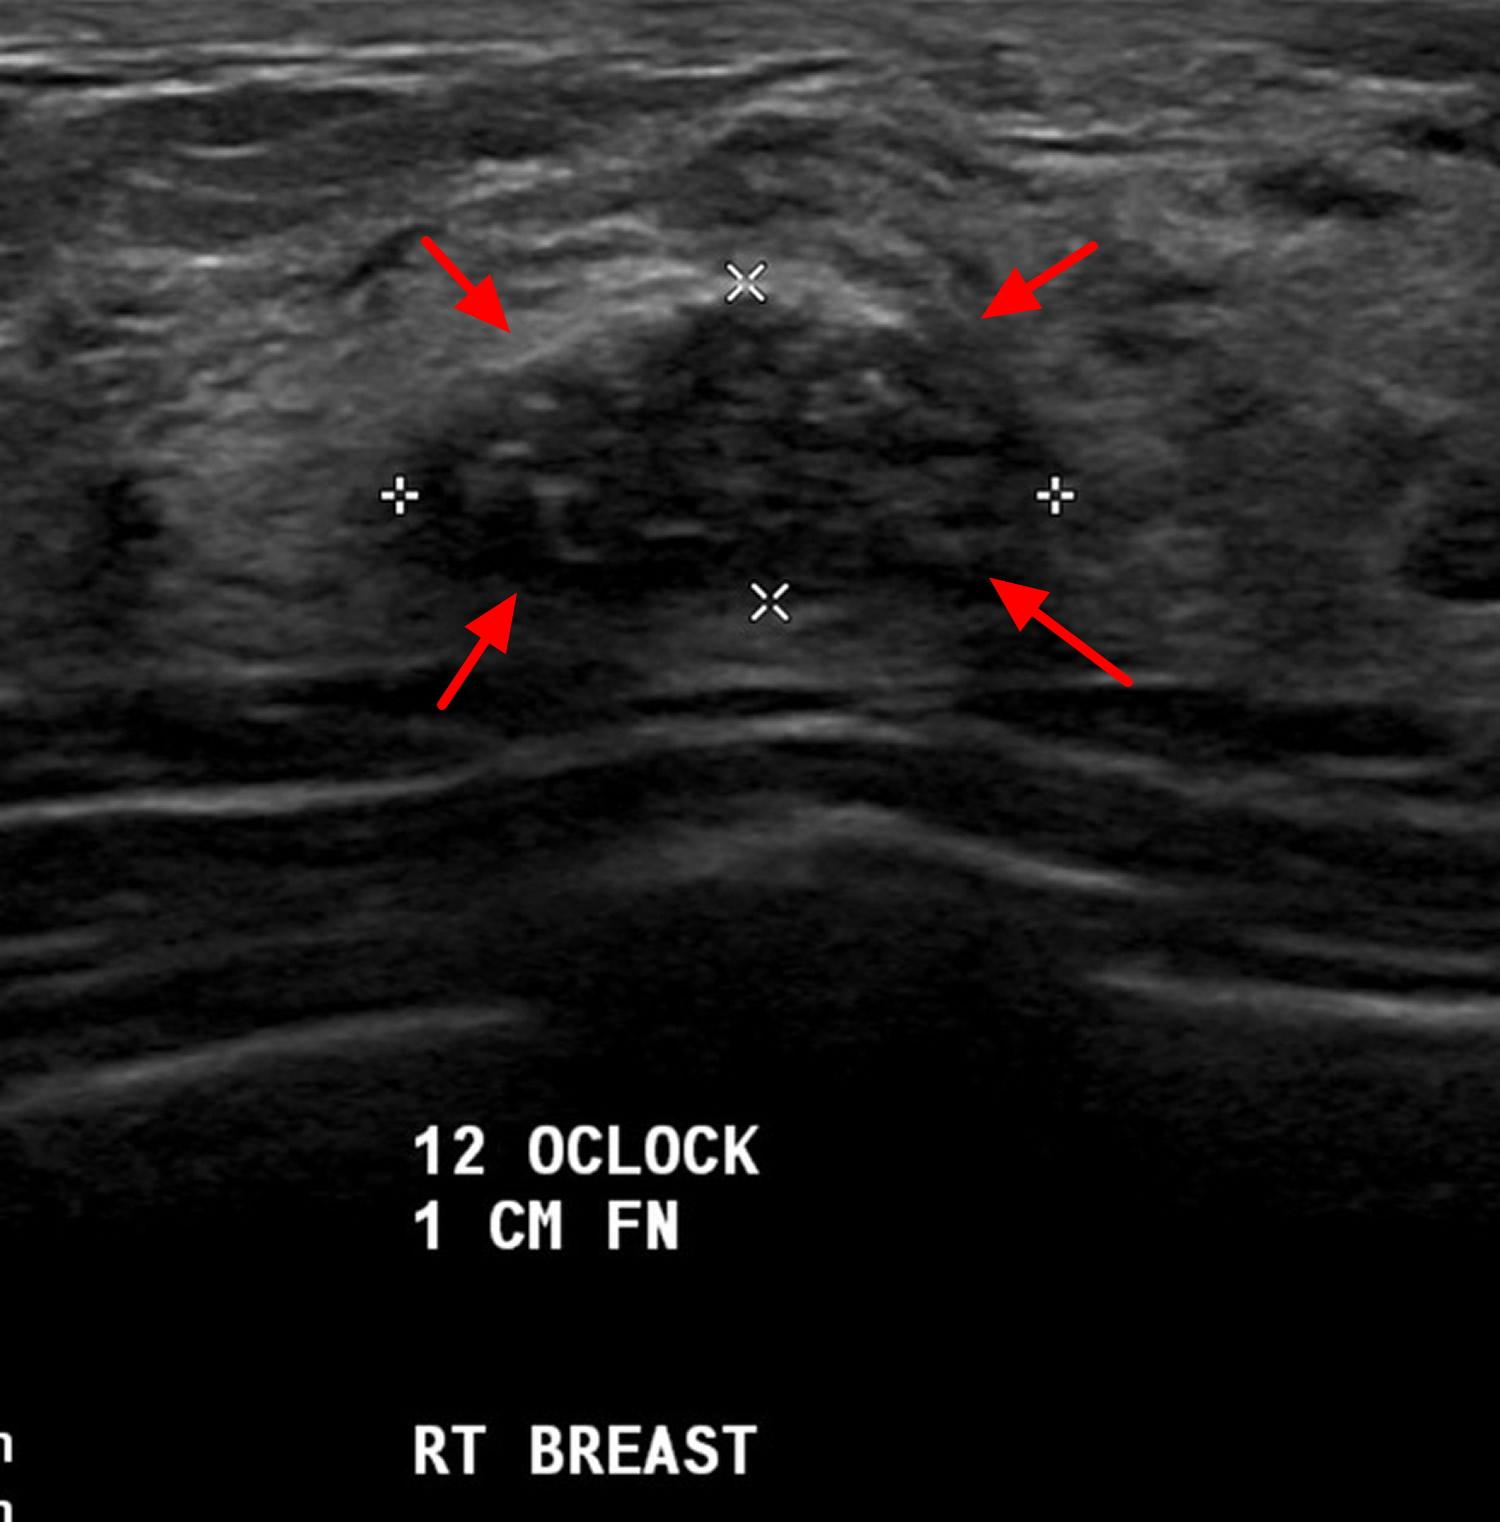 Fibroadenoma ultrasound